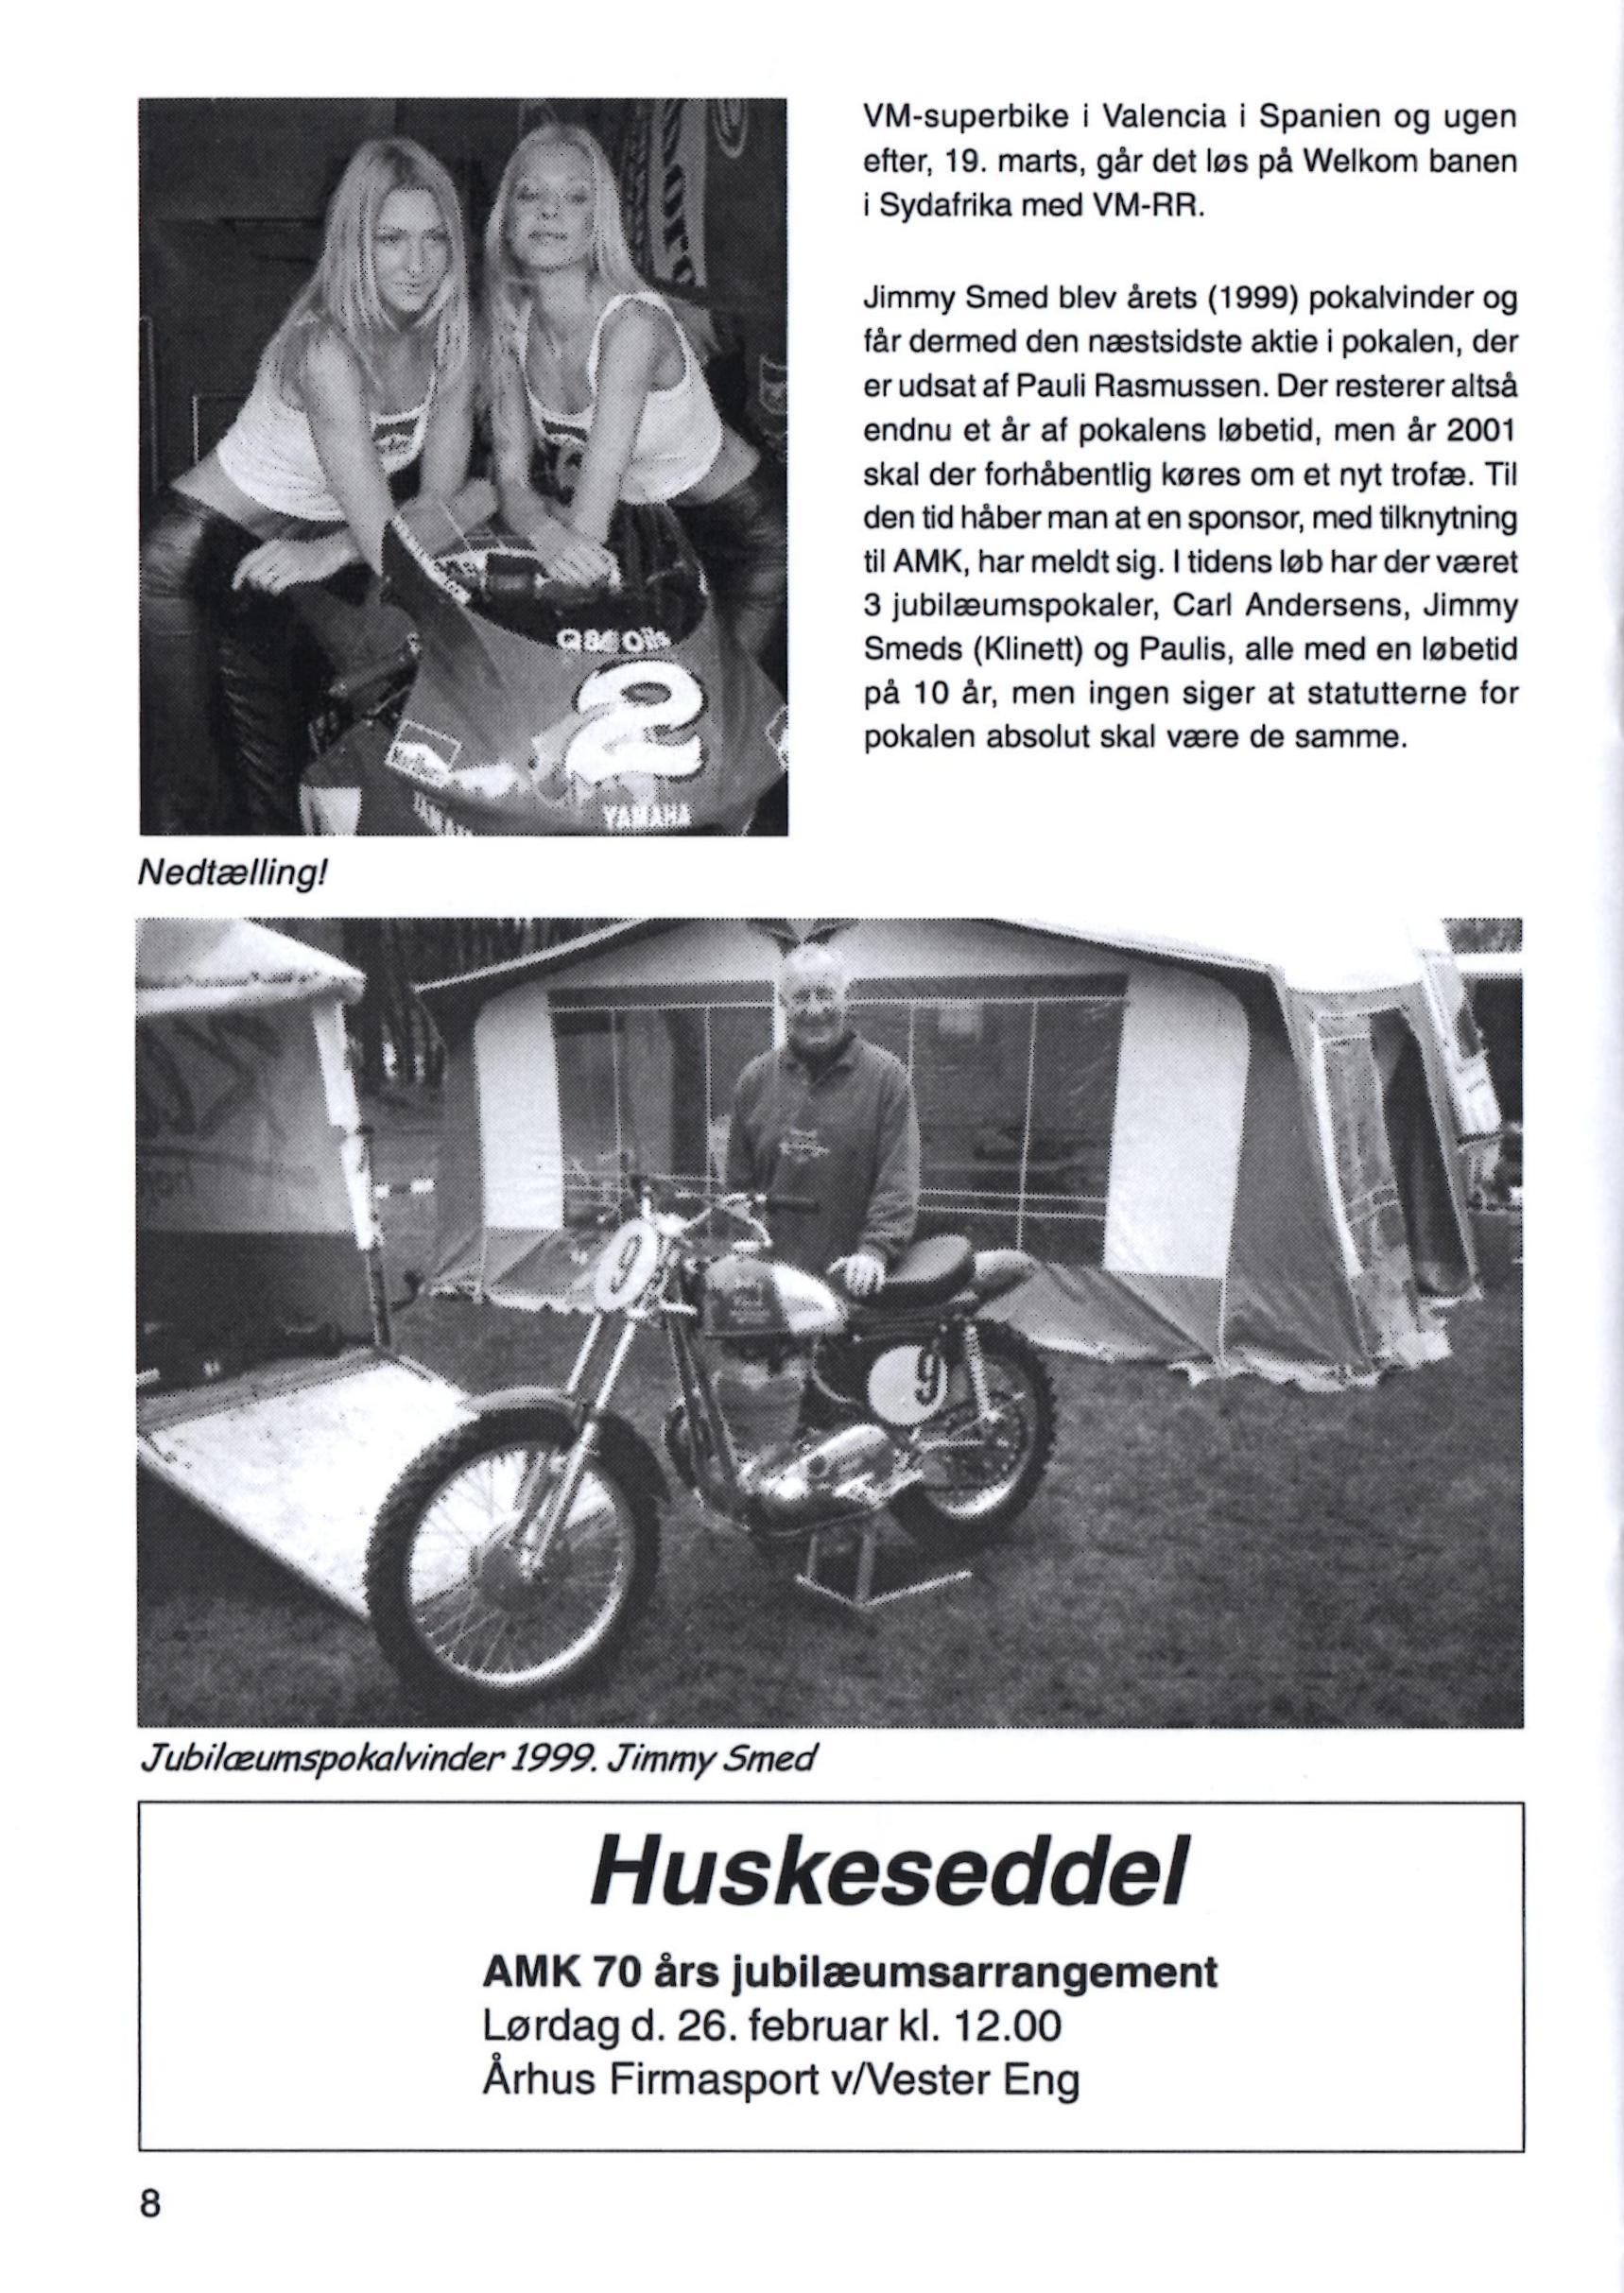 Huskeseddel for det kommende jubilæum i blad febr. 2000